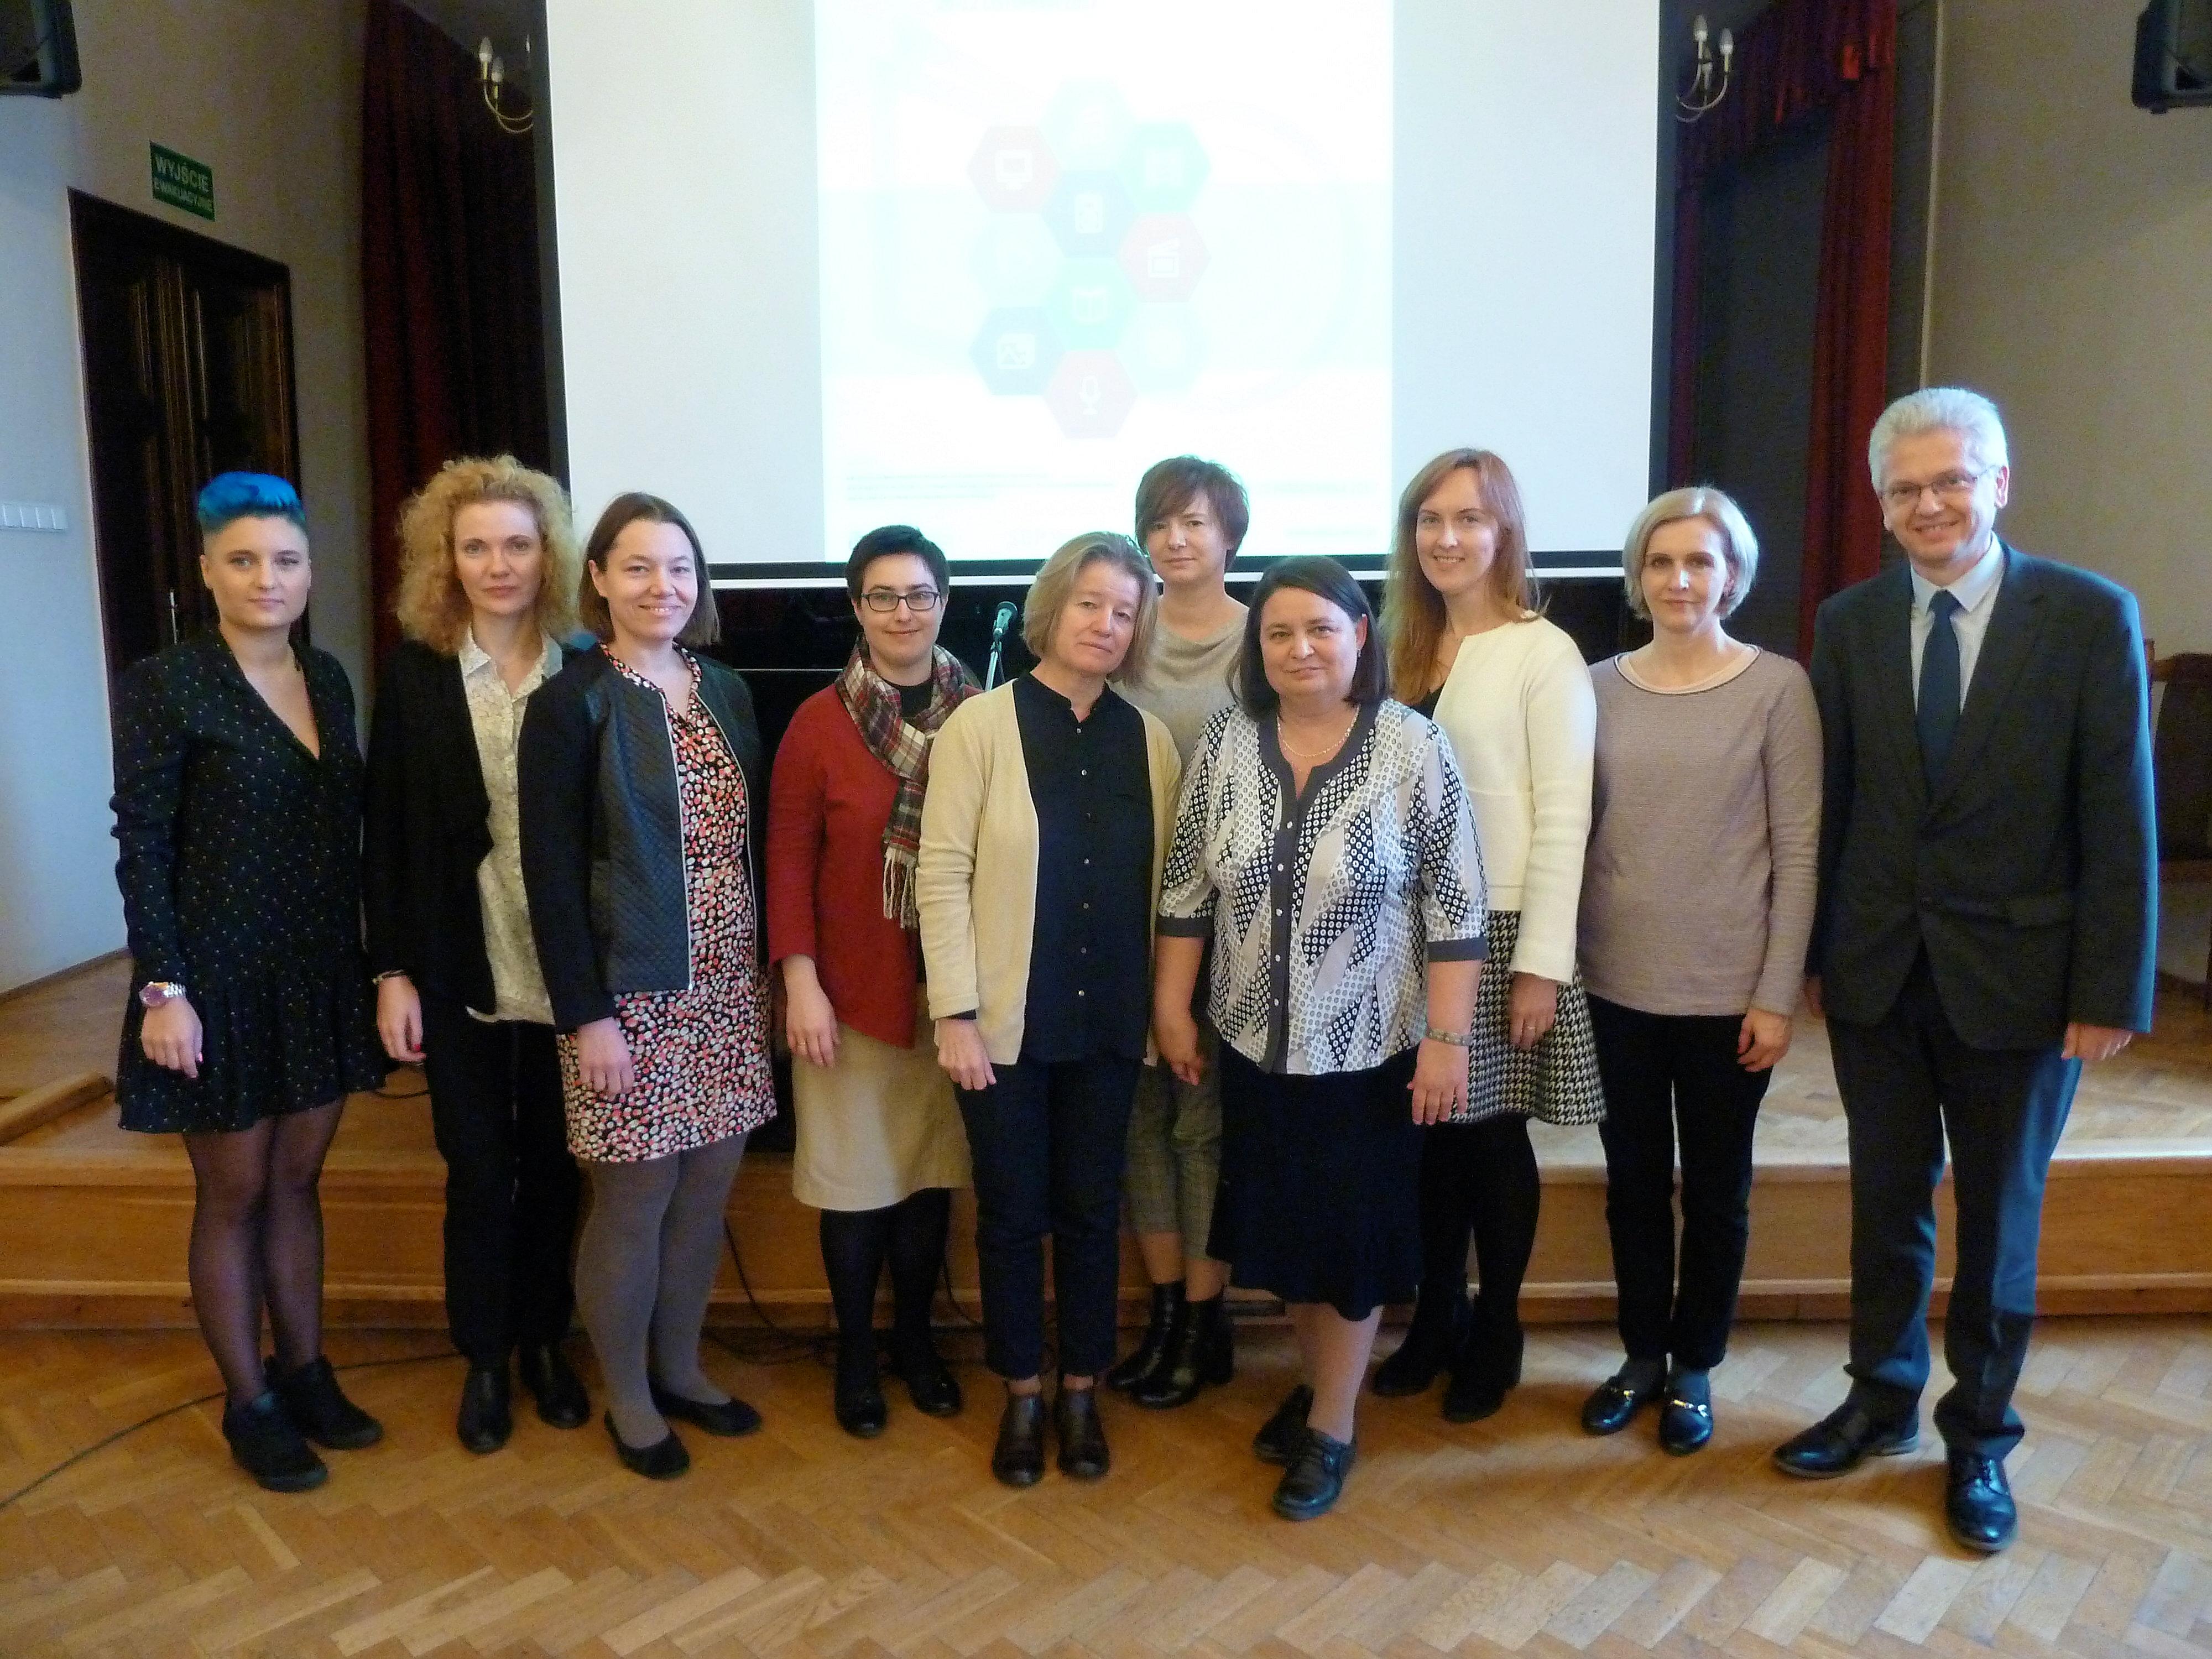 Members of IAML Poland November 2017